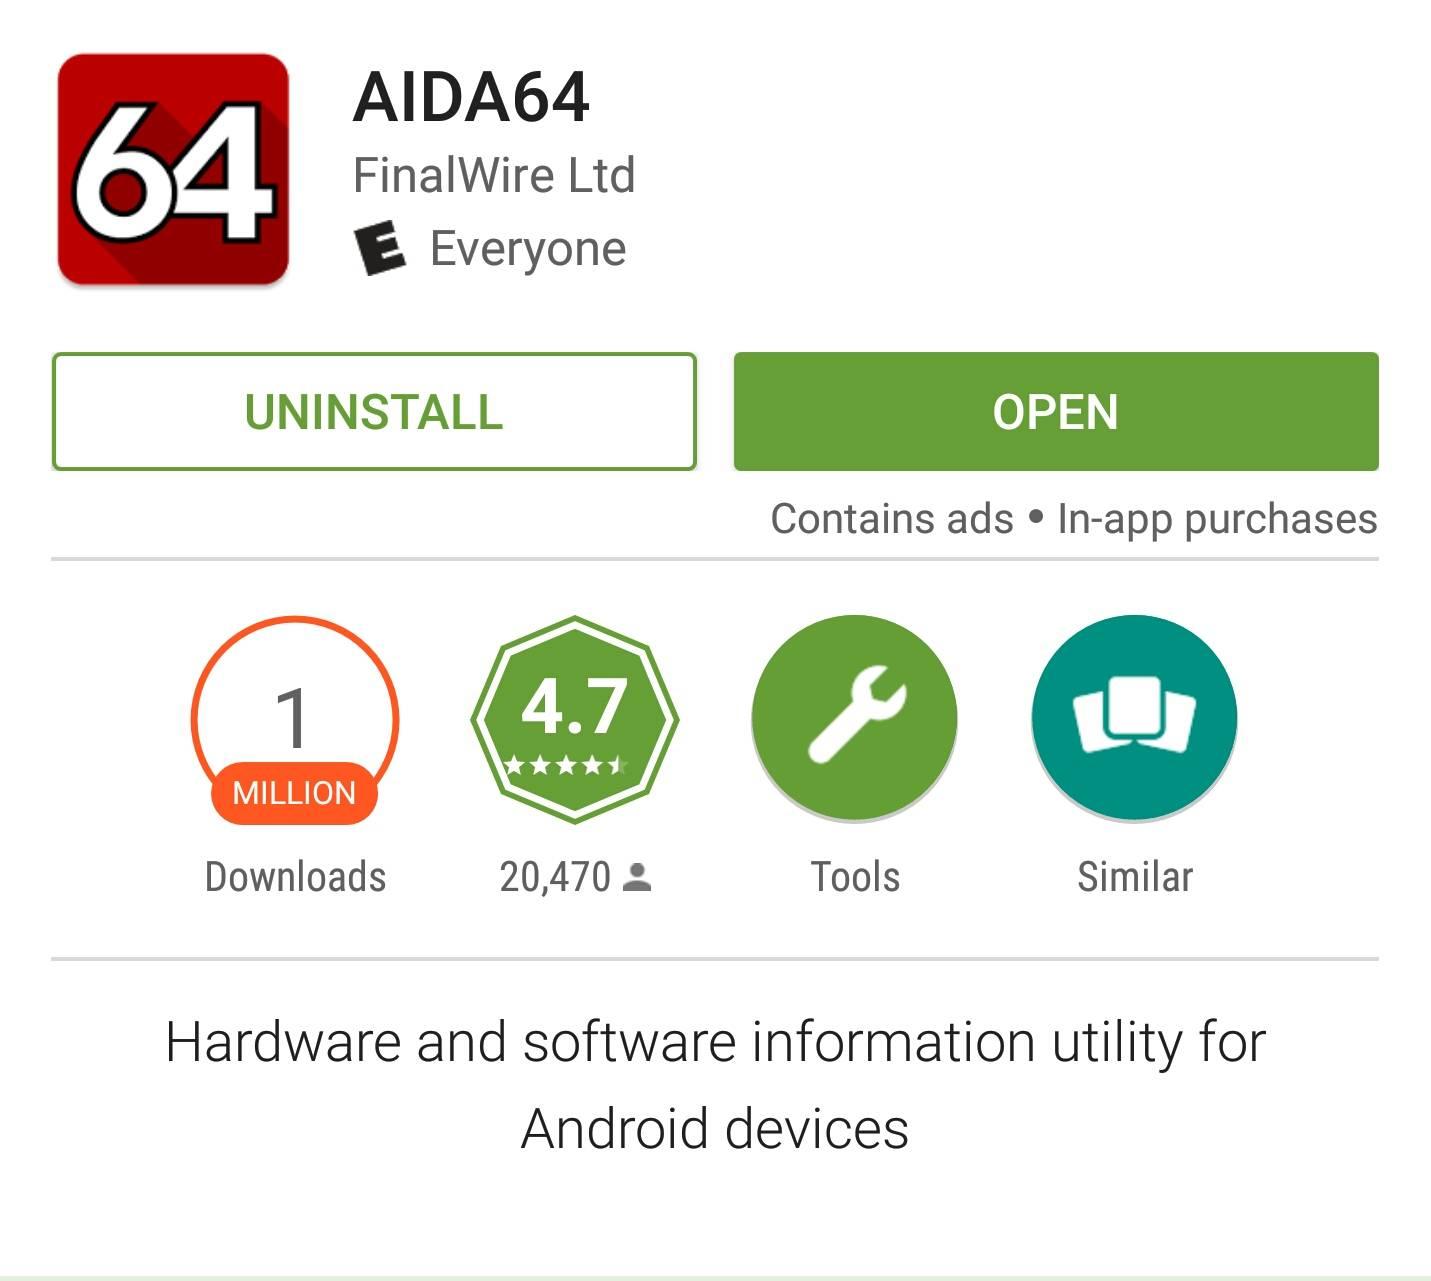 Google Play Store displaying